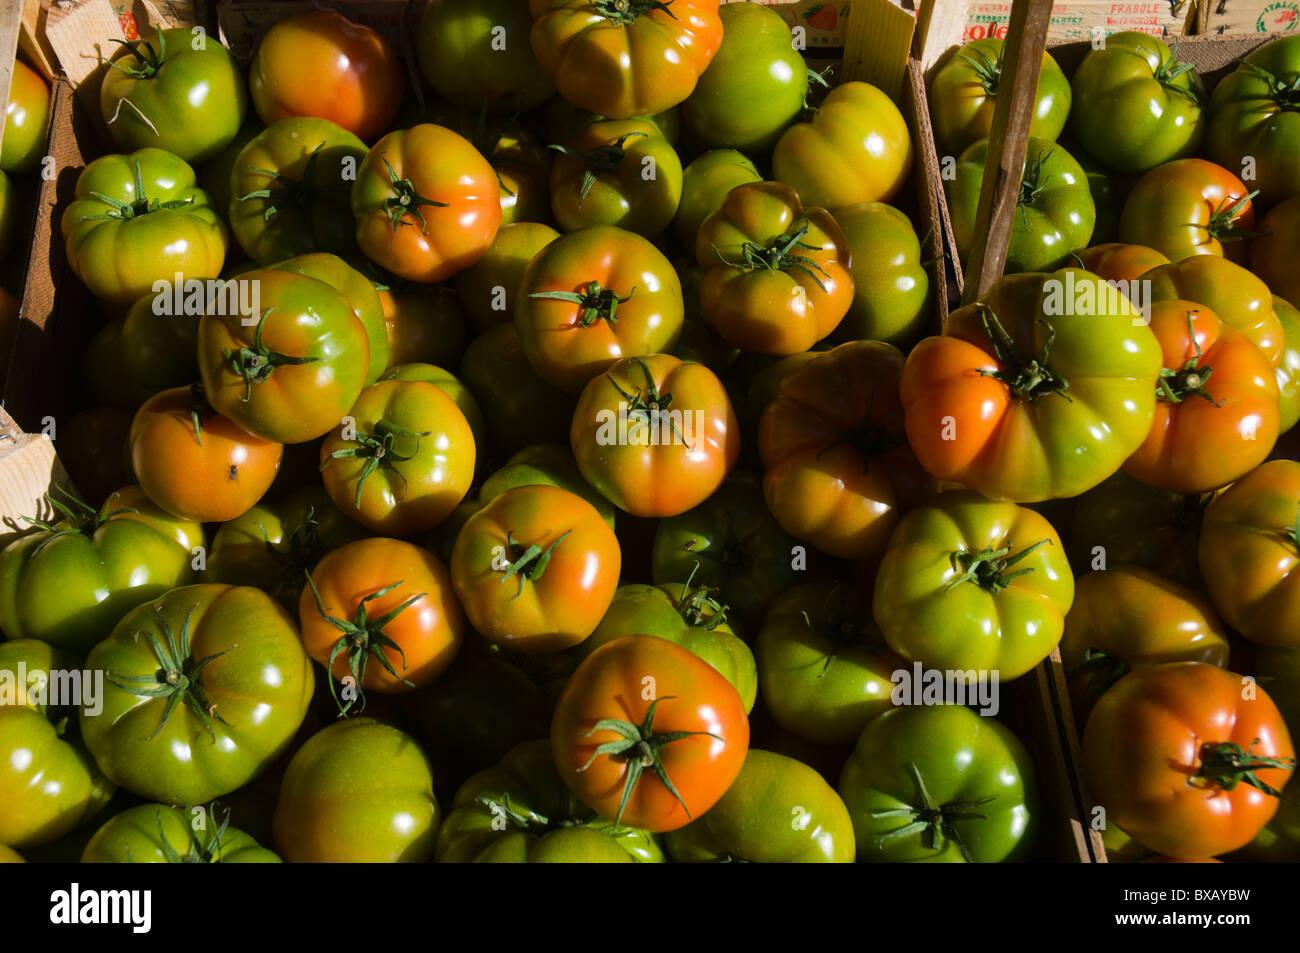 Tomatoes at mercato di Ballaro market Albergheria district central Palermo Sicily Italy Europe - Stock Image